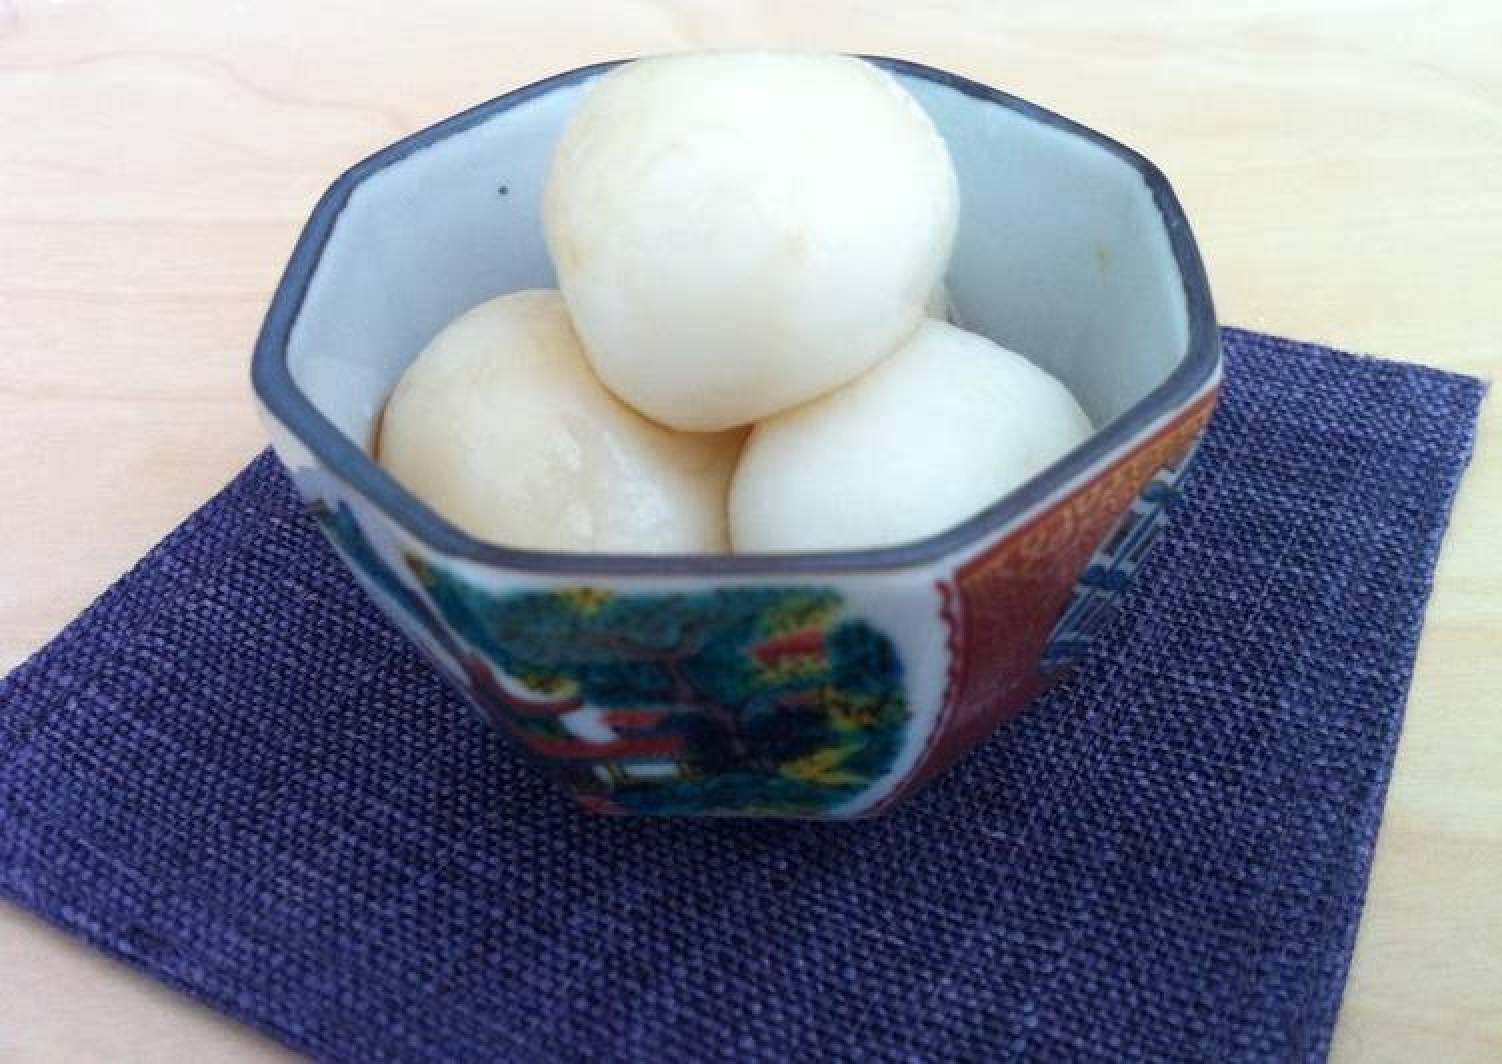 Soft Shiratama (Sticky Rice Ball) with Brown Sugar Syrup